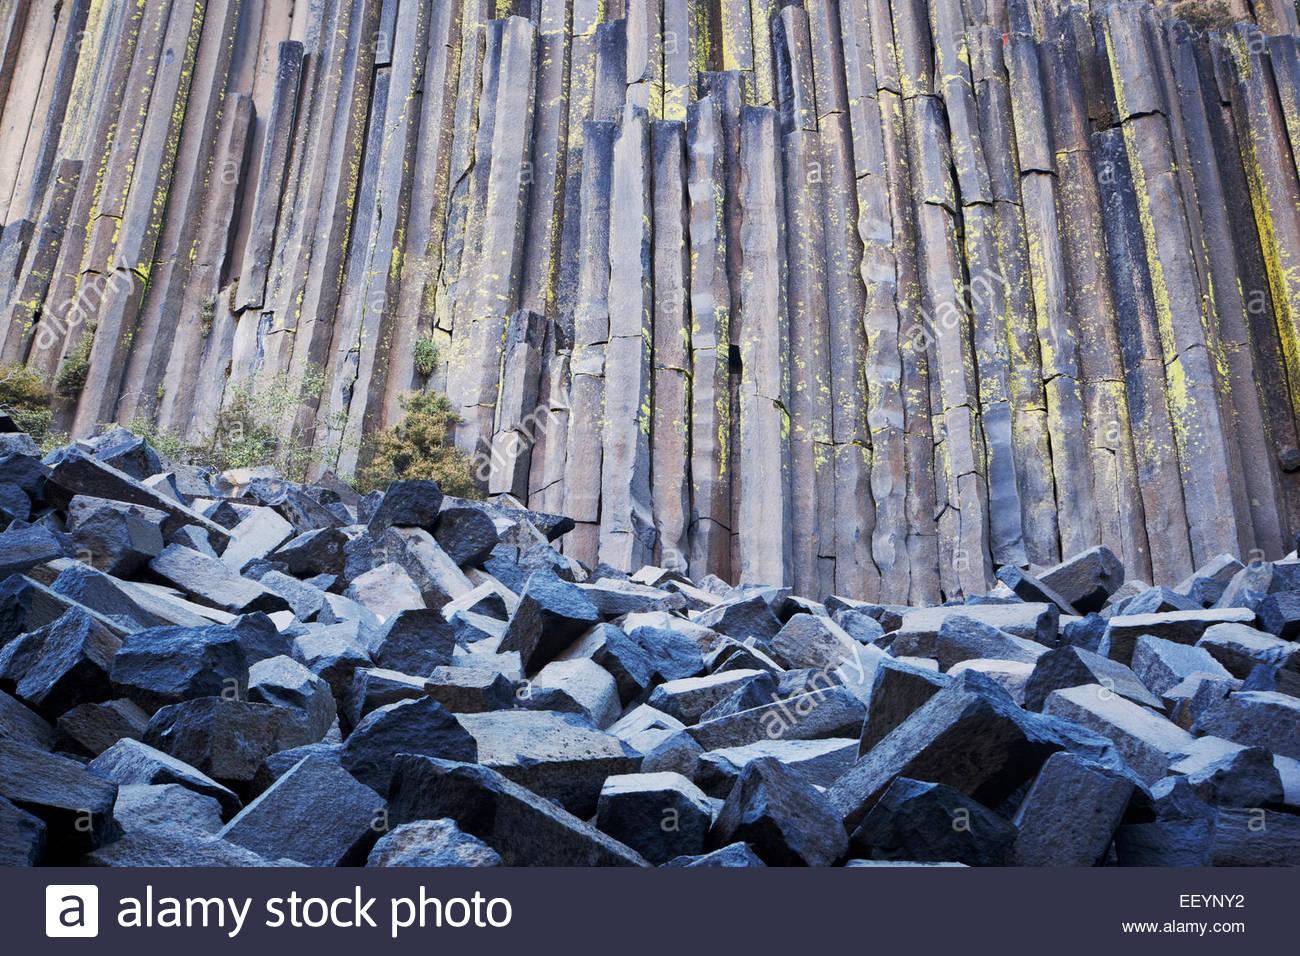 Columnar Basalt at Devils Postpile National Monument, California - Stock Image